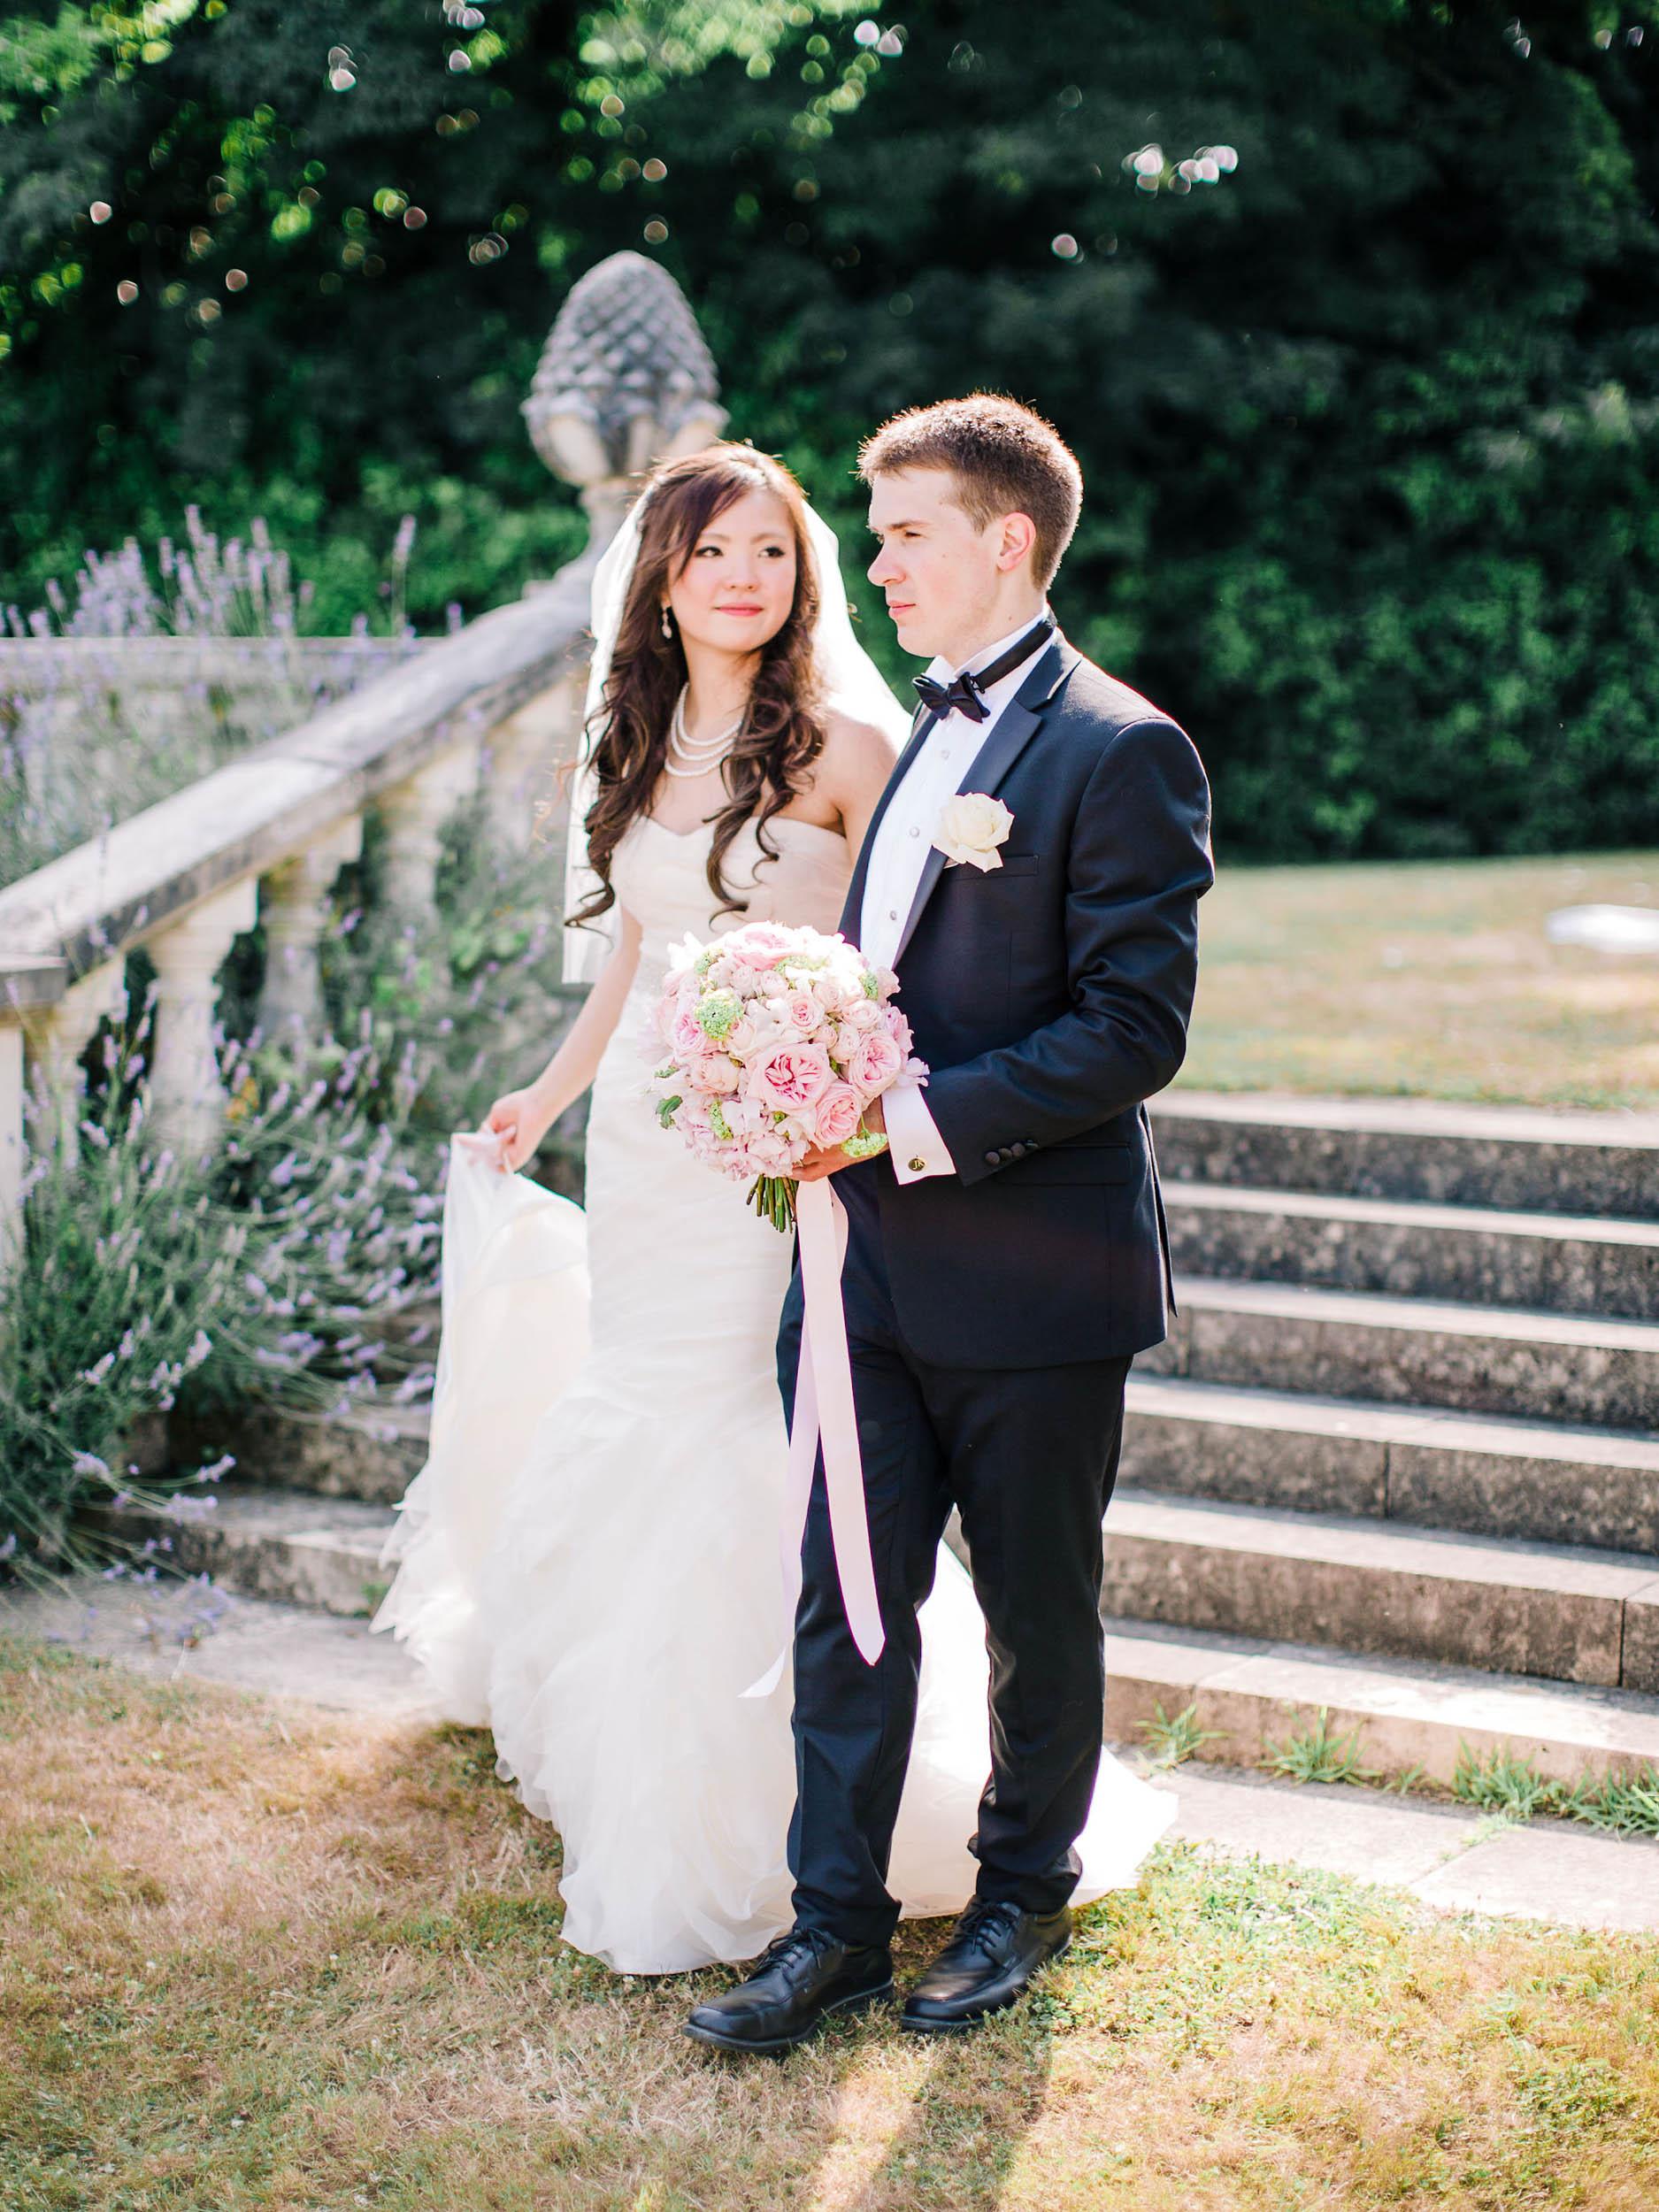 Amy O'Boyle Photography- Destination & UK Fine Art Film Wedding Photographer- Chateau La Durantie Wedding-25.jpg